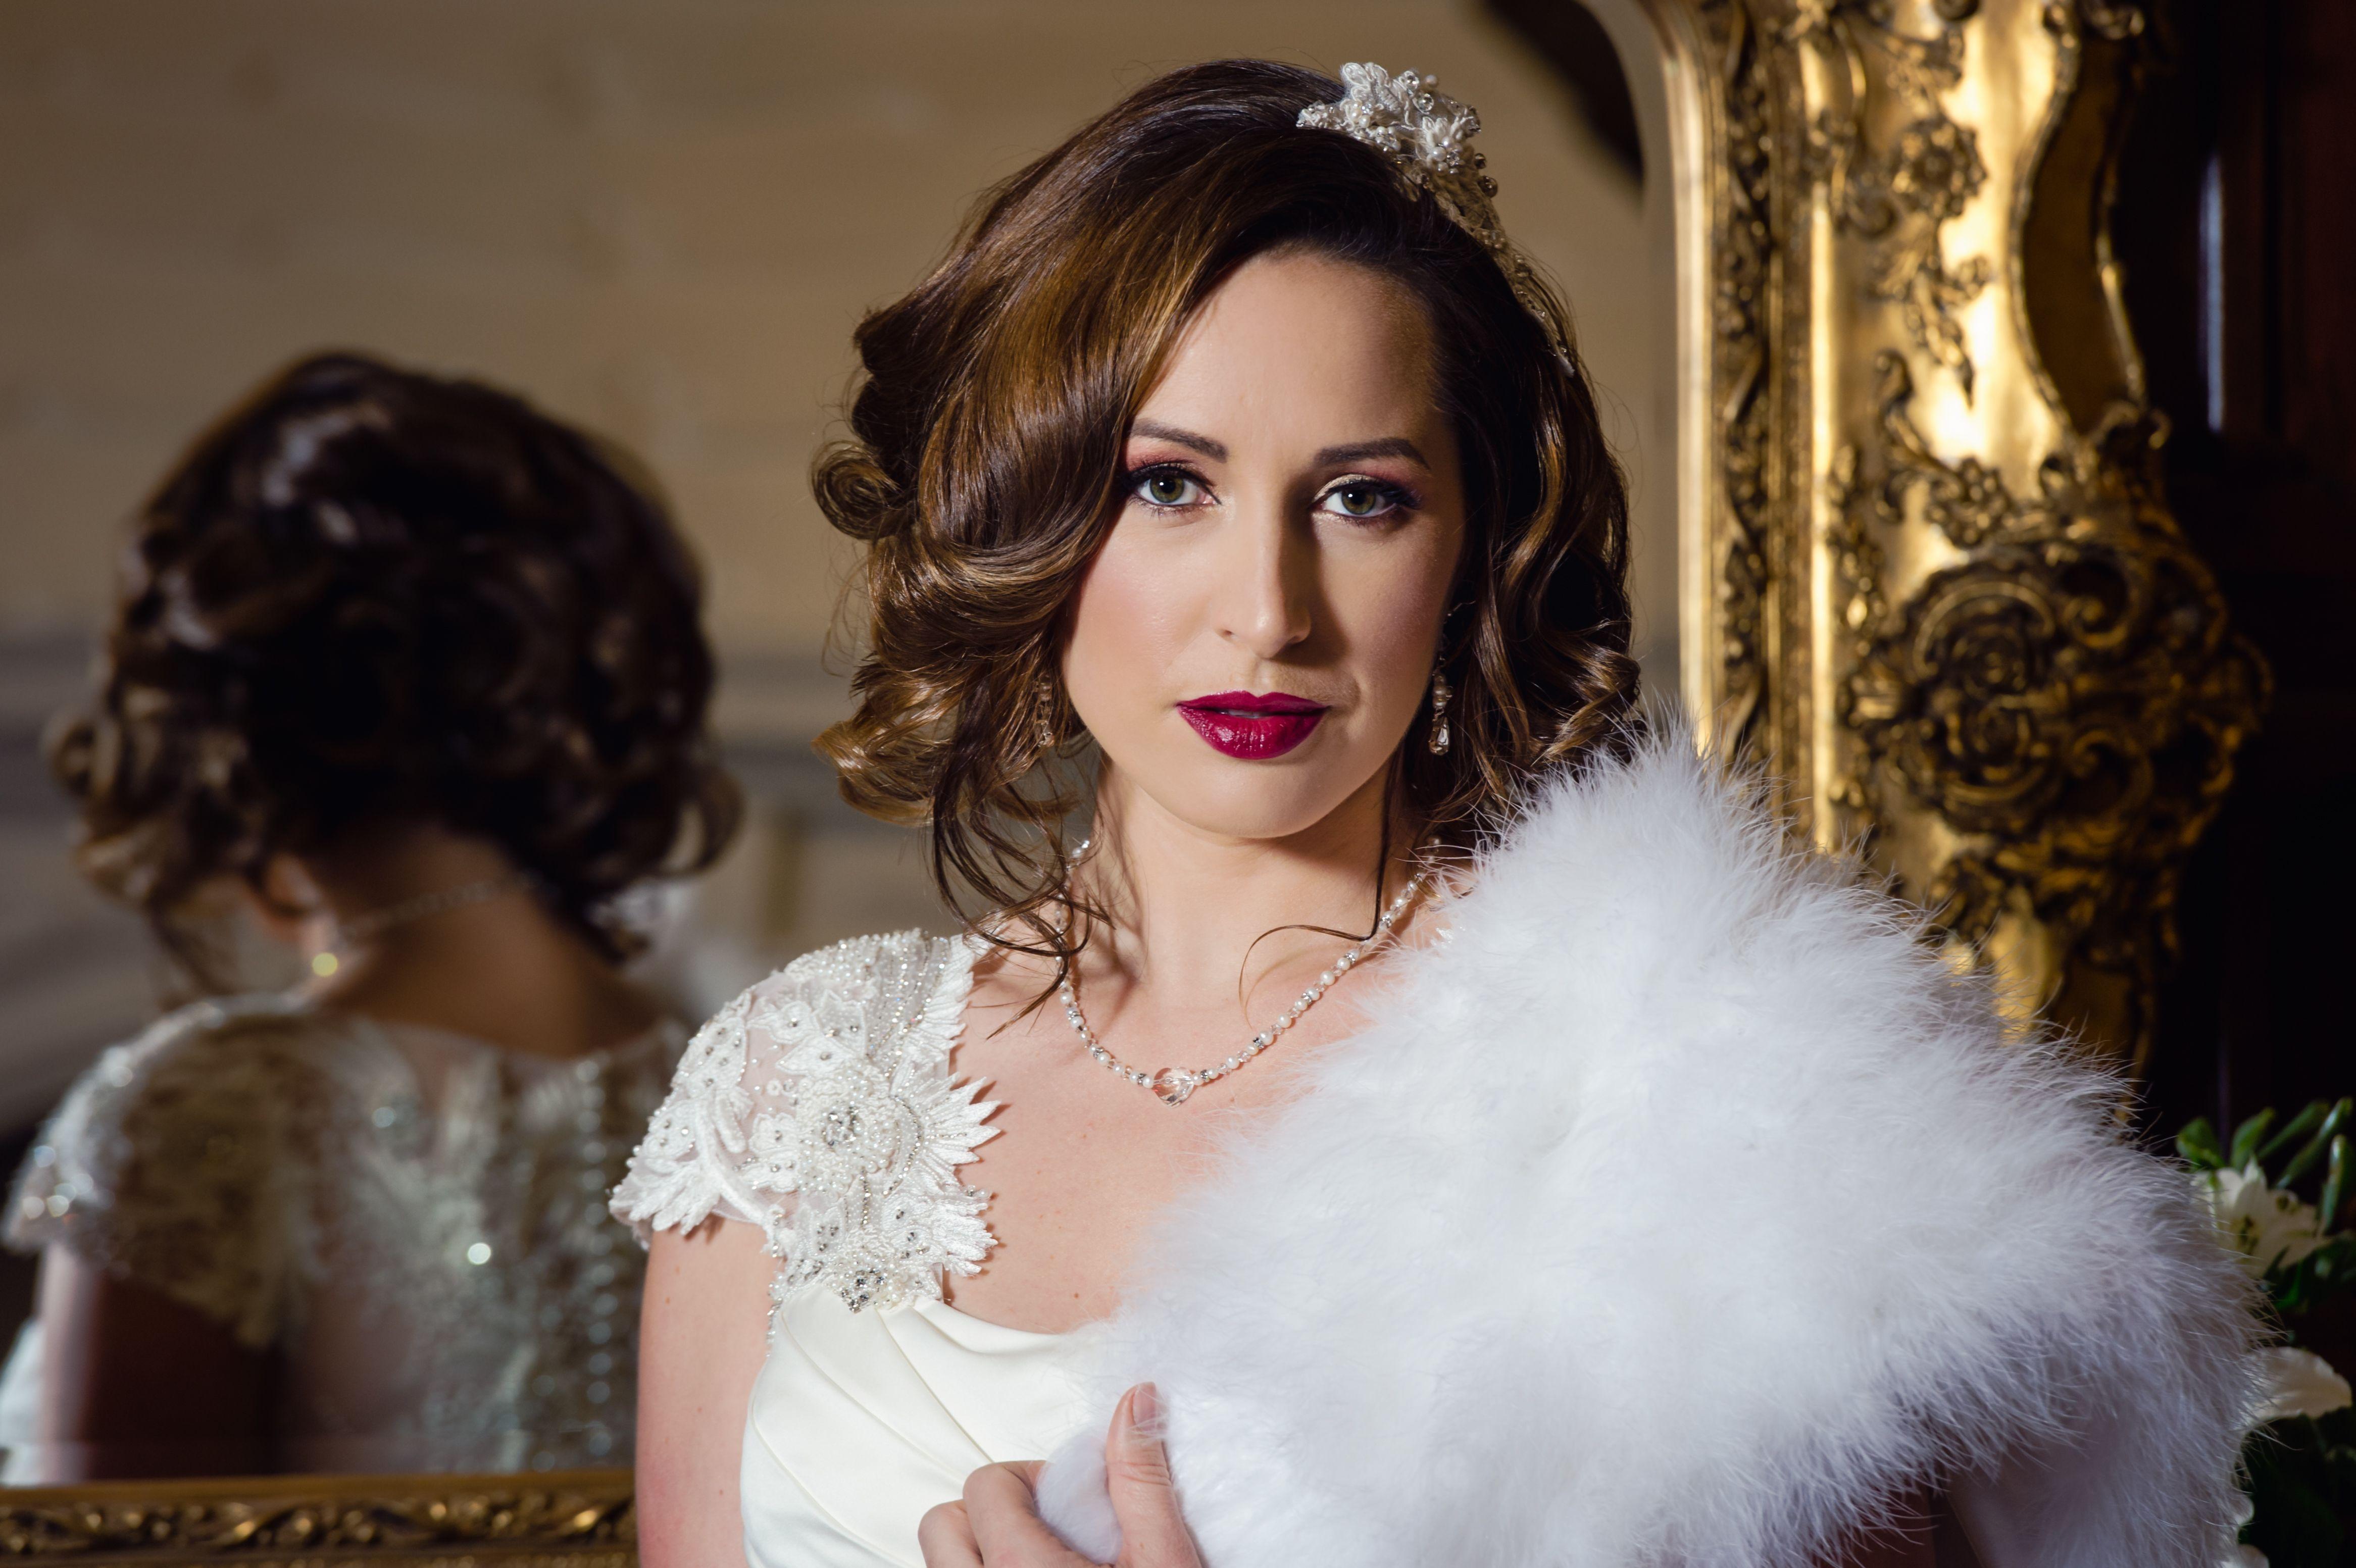 autumn winter bride vintage style downton abbey inspiration. make-up